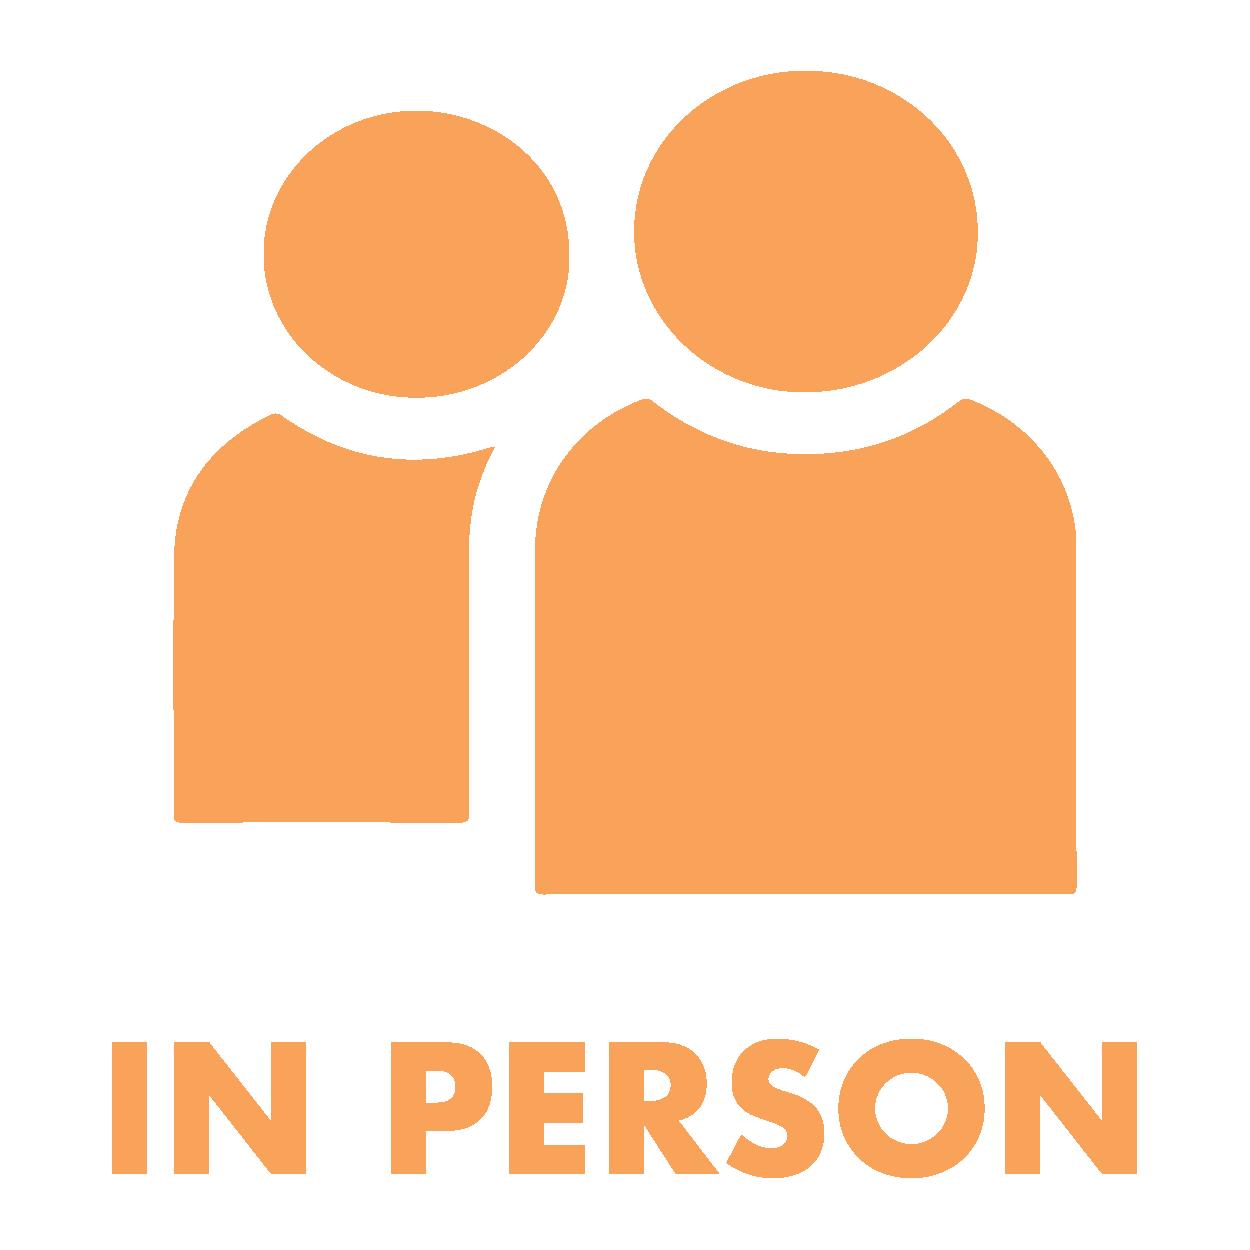 in person icon - transparent